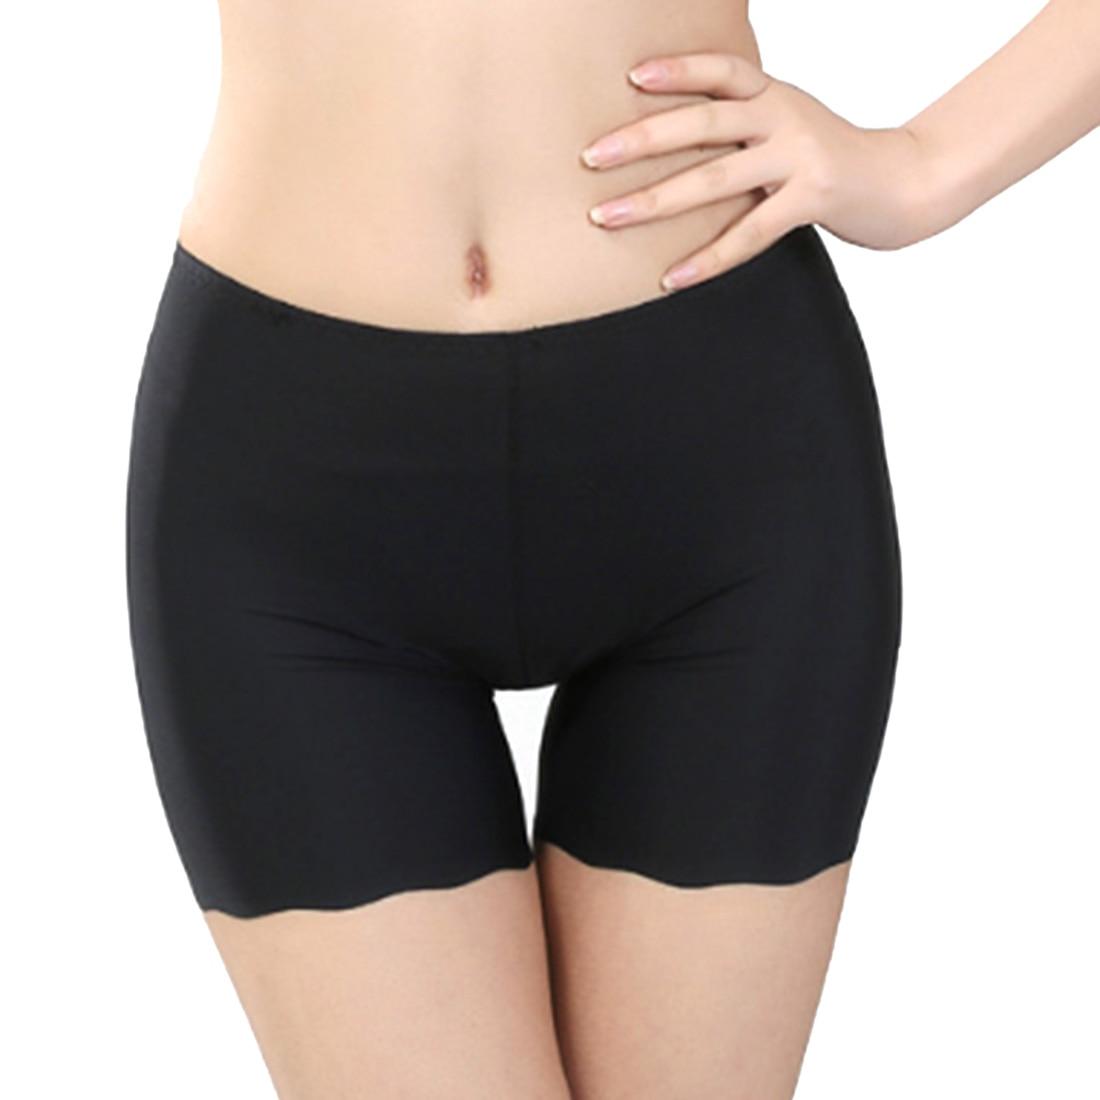 Hot Selling Female Sexy Women High Waist Ice Silk Briefs Seamless Elastic Pants Short Leggings White/ Black/ Skin